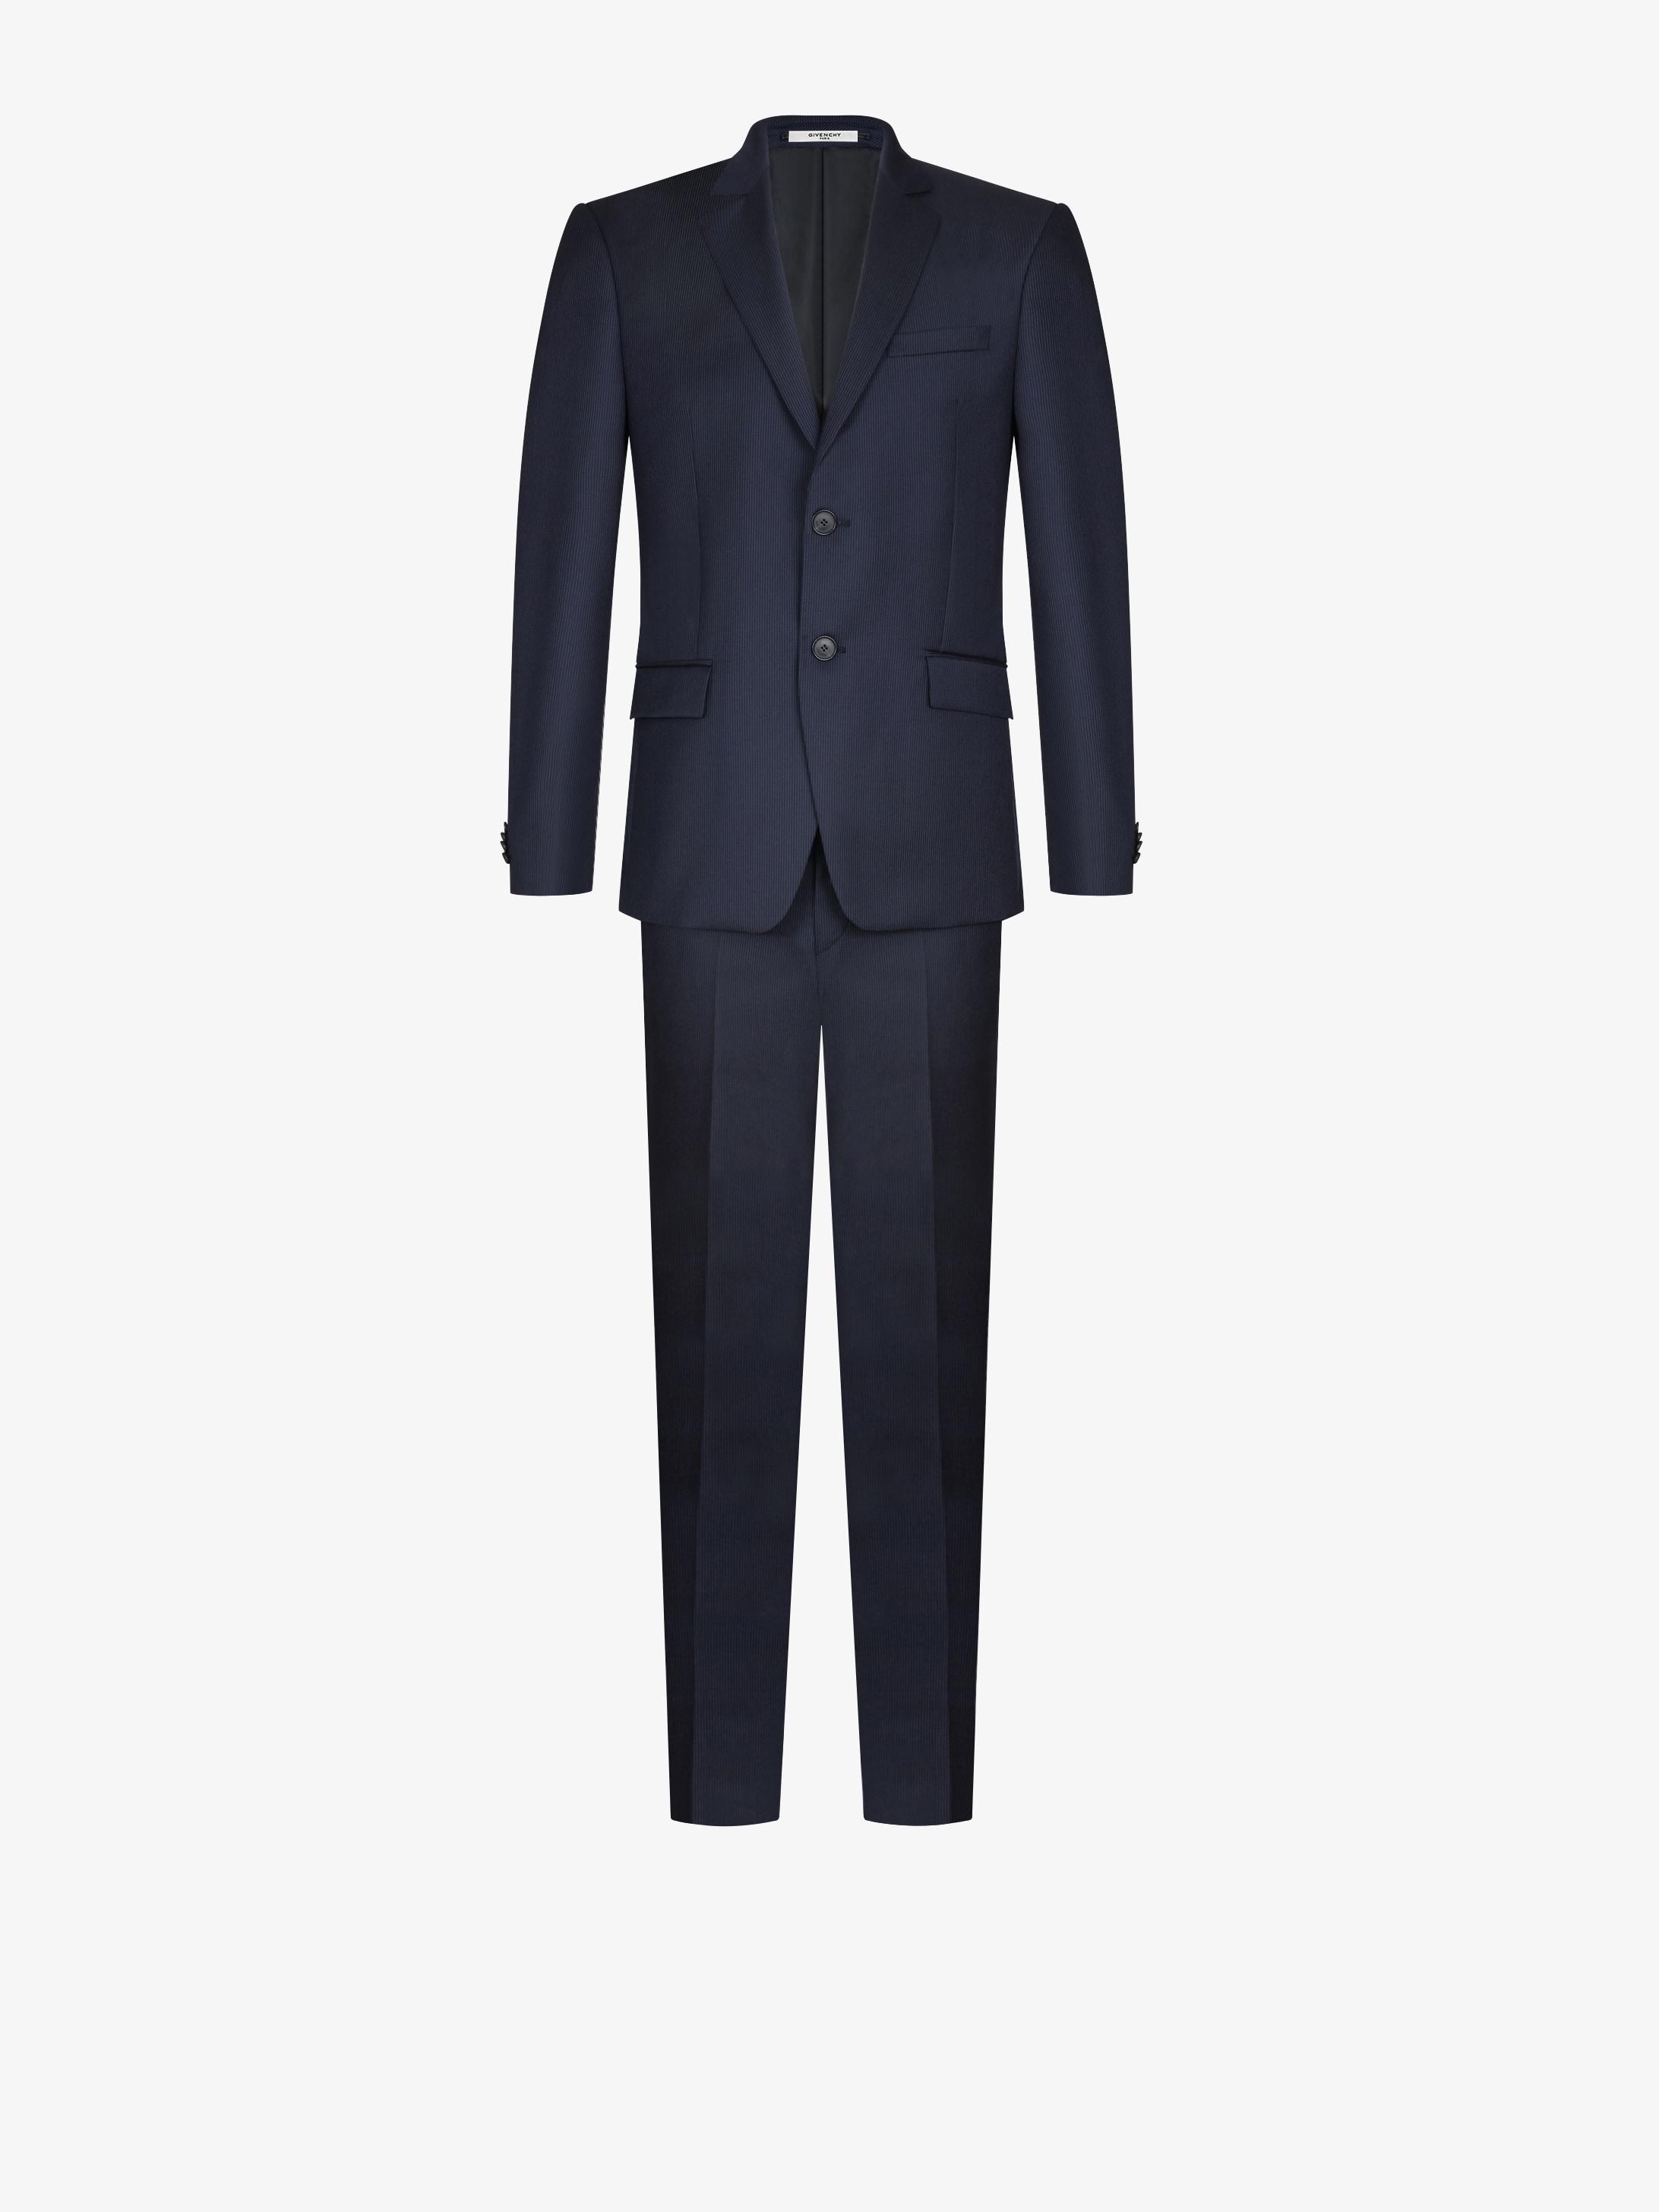 Regular fit pinstripe wool suit